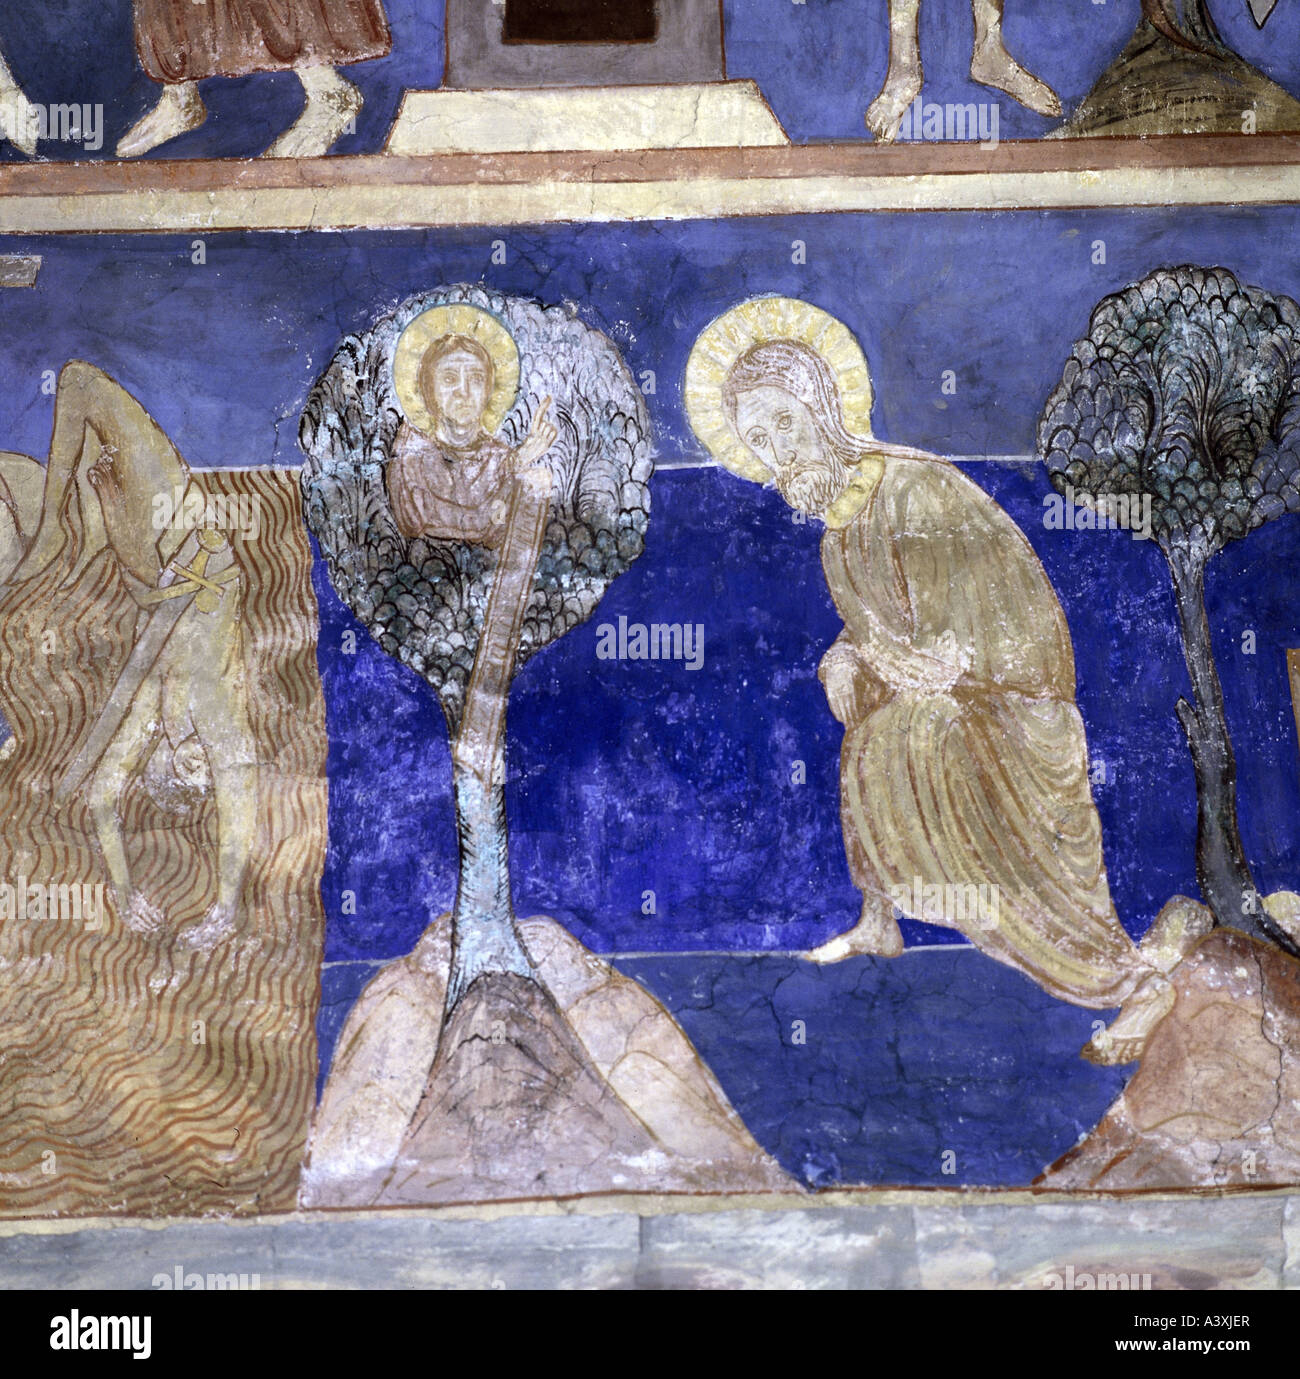 Religious Art: Fine Arts, Religious Art, Jesus Christ, Genealogy